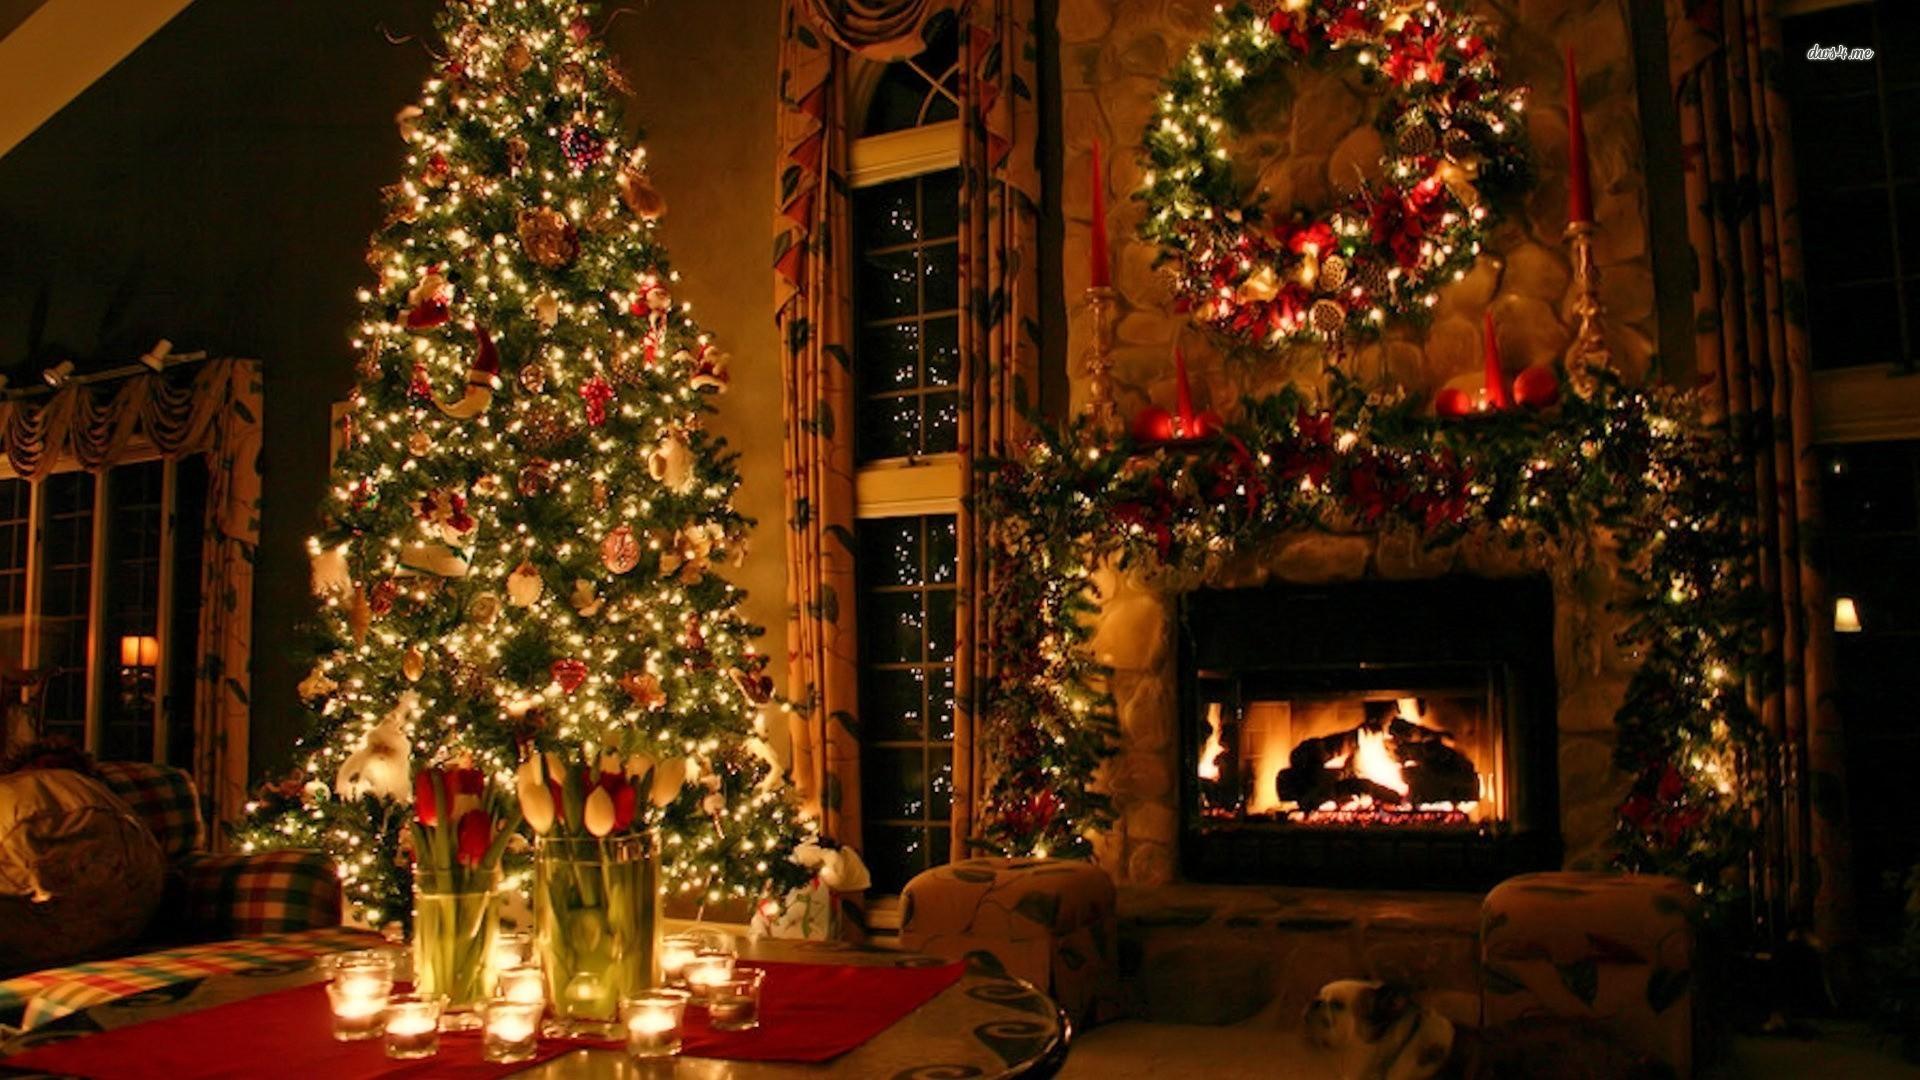 Christmas Wallpaper For Desktop.Desktop Wallpaper Christmas 63 Pictures